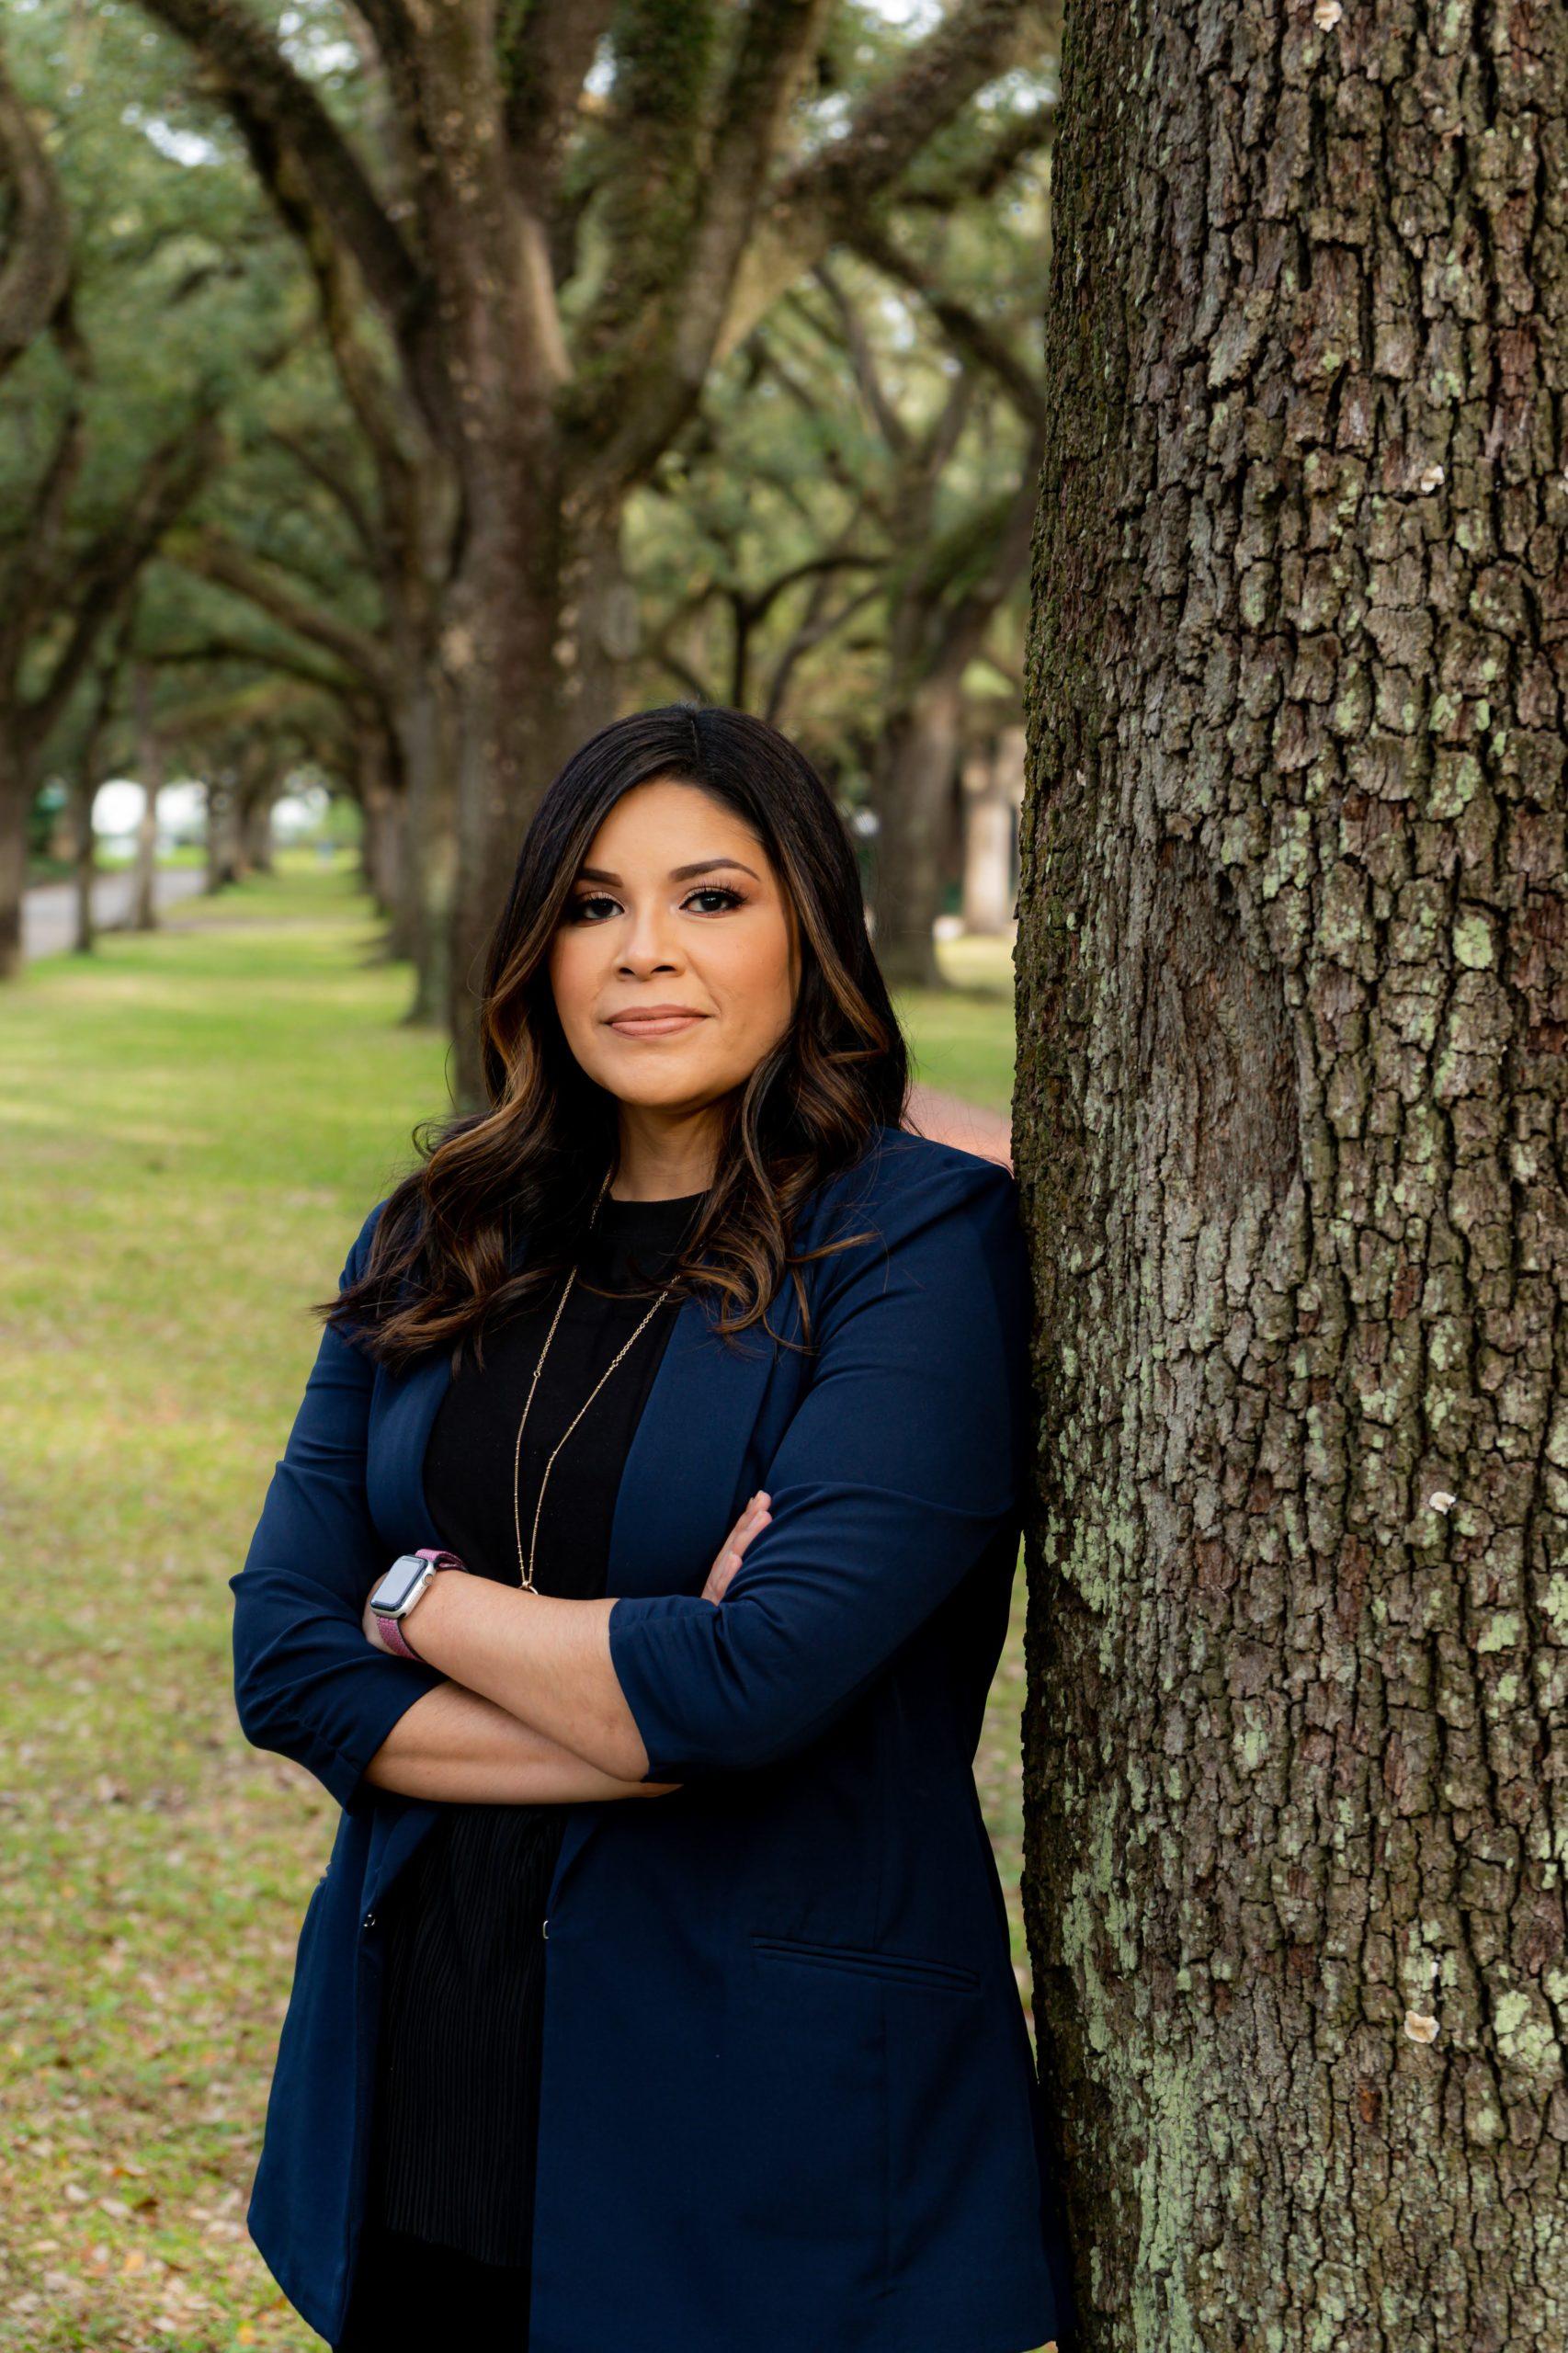 Denise Hernandez, R.D., L.D.